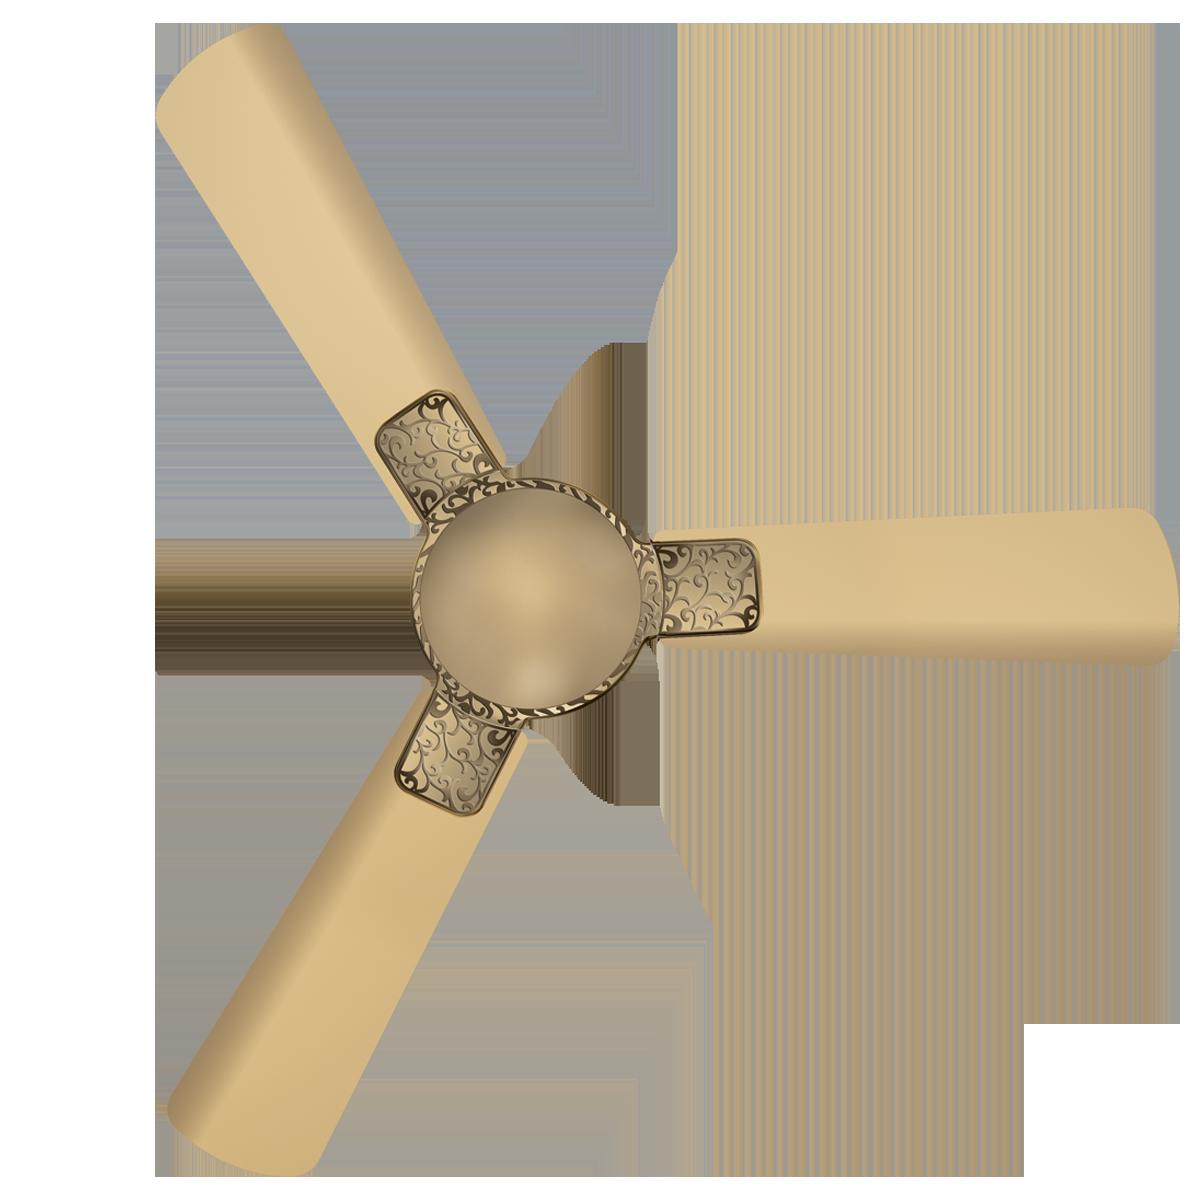 Havells Enticer Art Aafreen 120cm Sweep 3 Blade Ceiling Fan (Dust Resistant, FHCETSTBEG48, Beige)_1